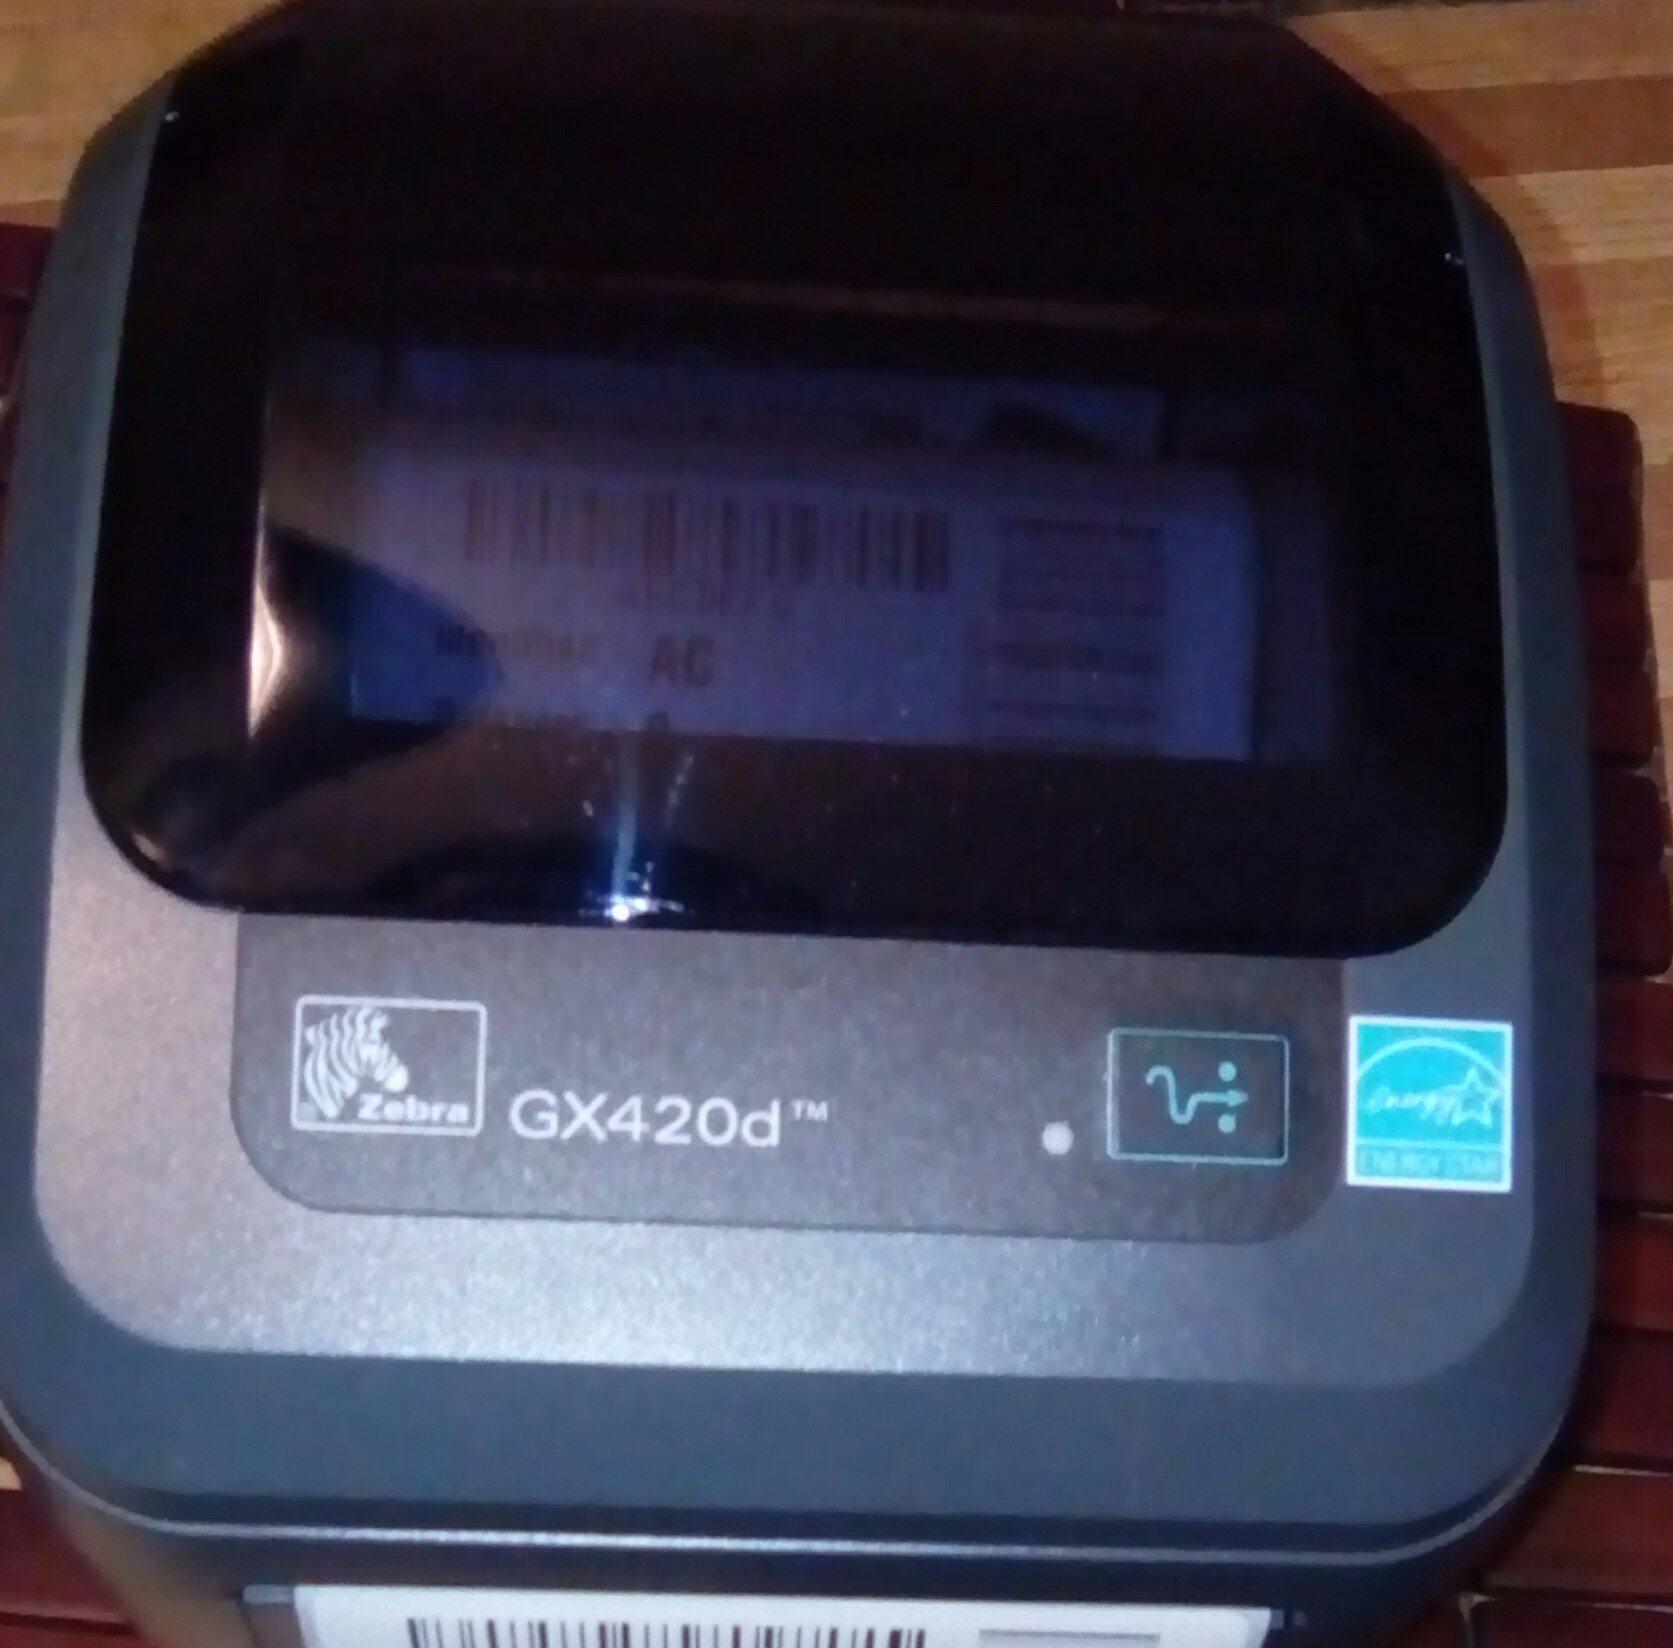 Zebra GX420d GX42-202510-000 Printer W/ New Adapter, USB, & Power Cables